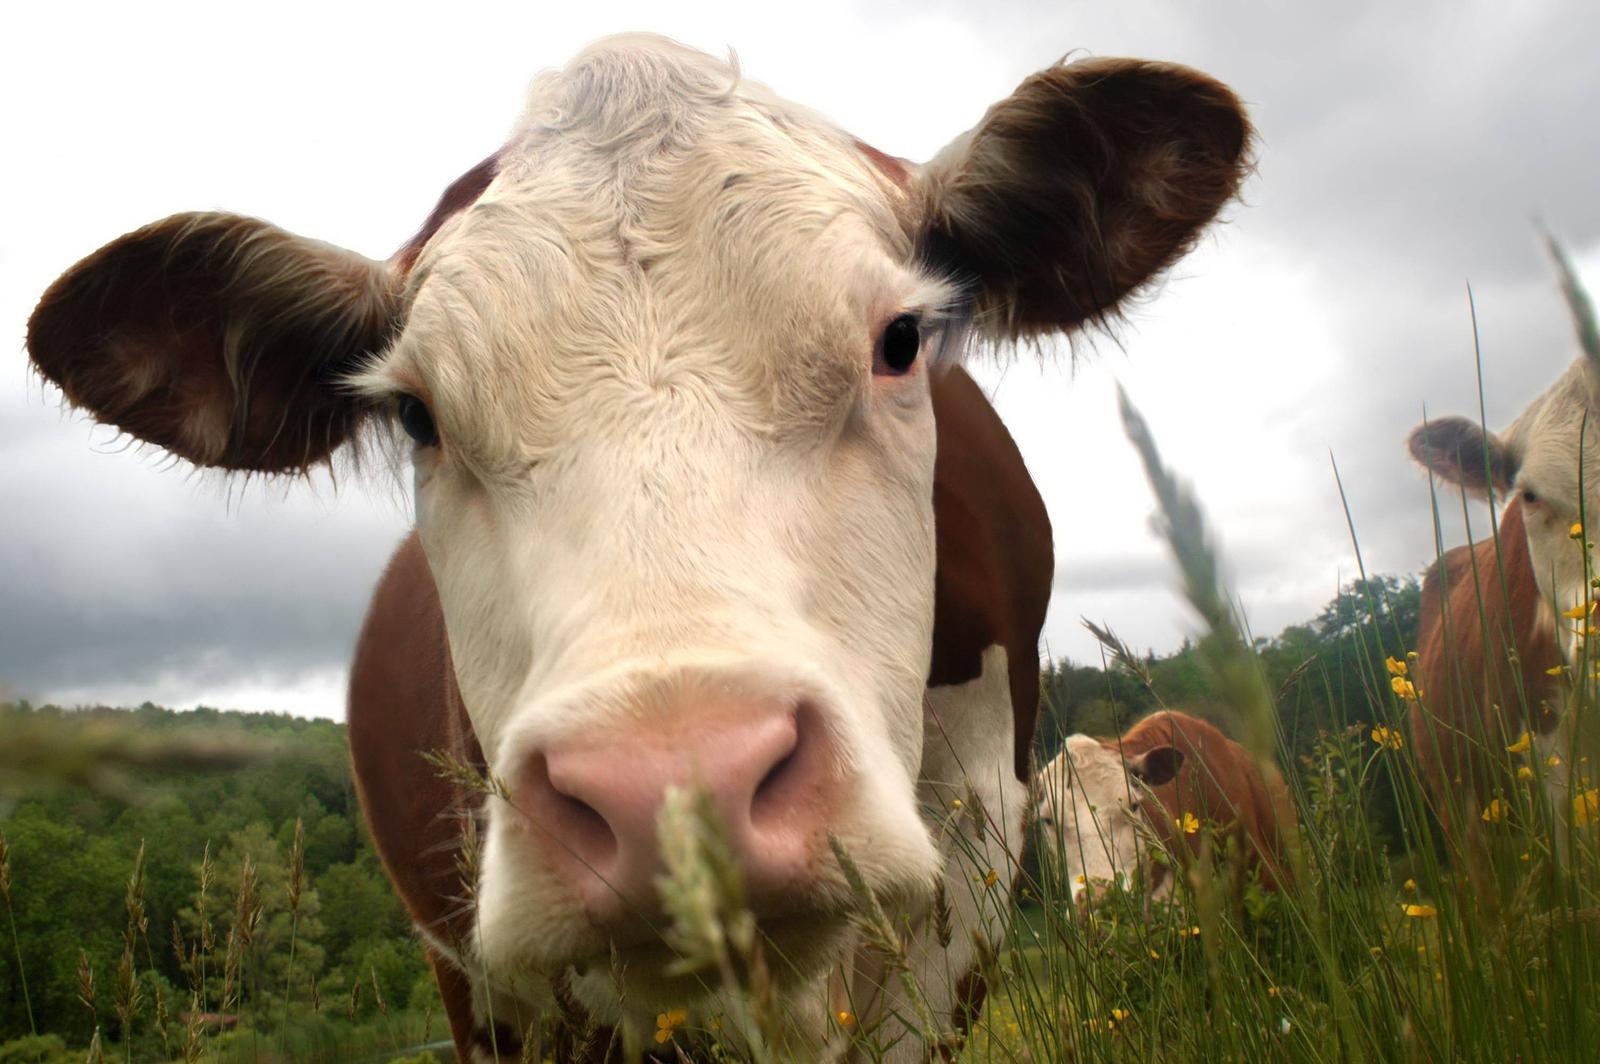 bigstockphoto_perspective_cows_779256.jpg